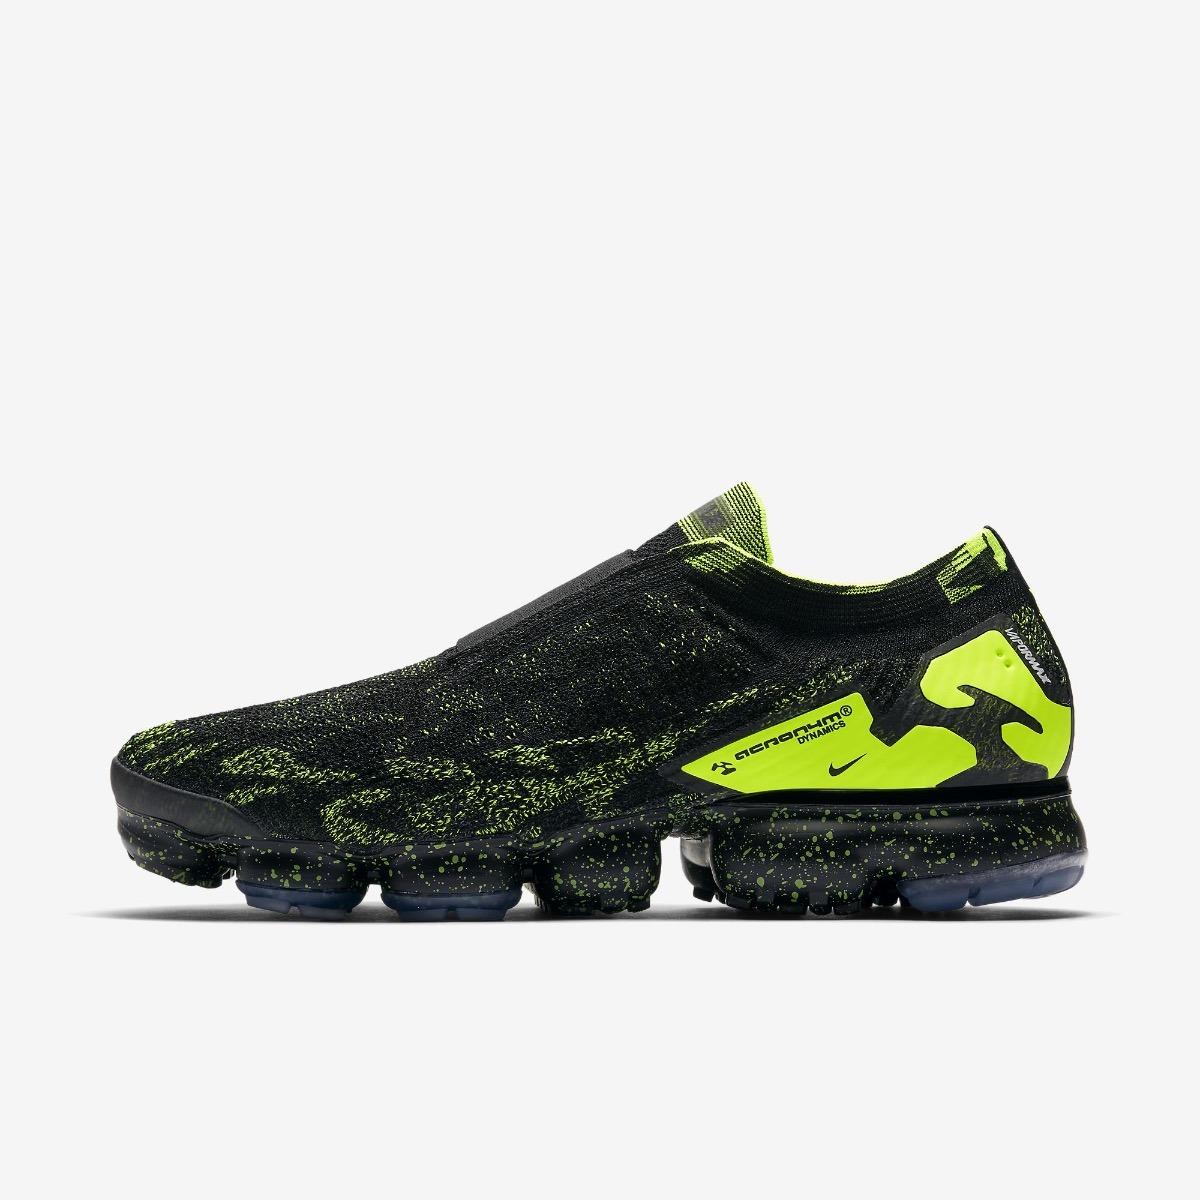 4c463e8580191 tênis nikelab air vapormax x acronym flyknit moc 2 - sneaker. Carregando  zoom.